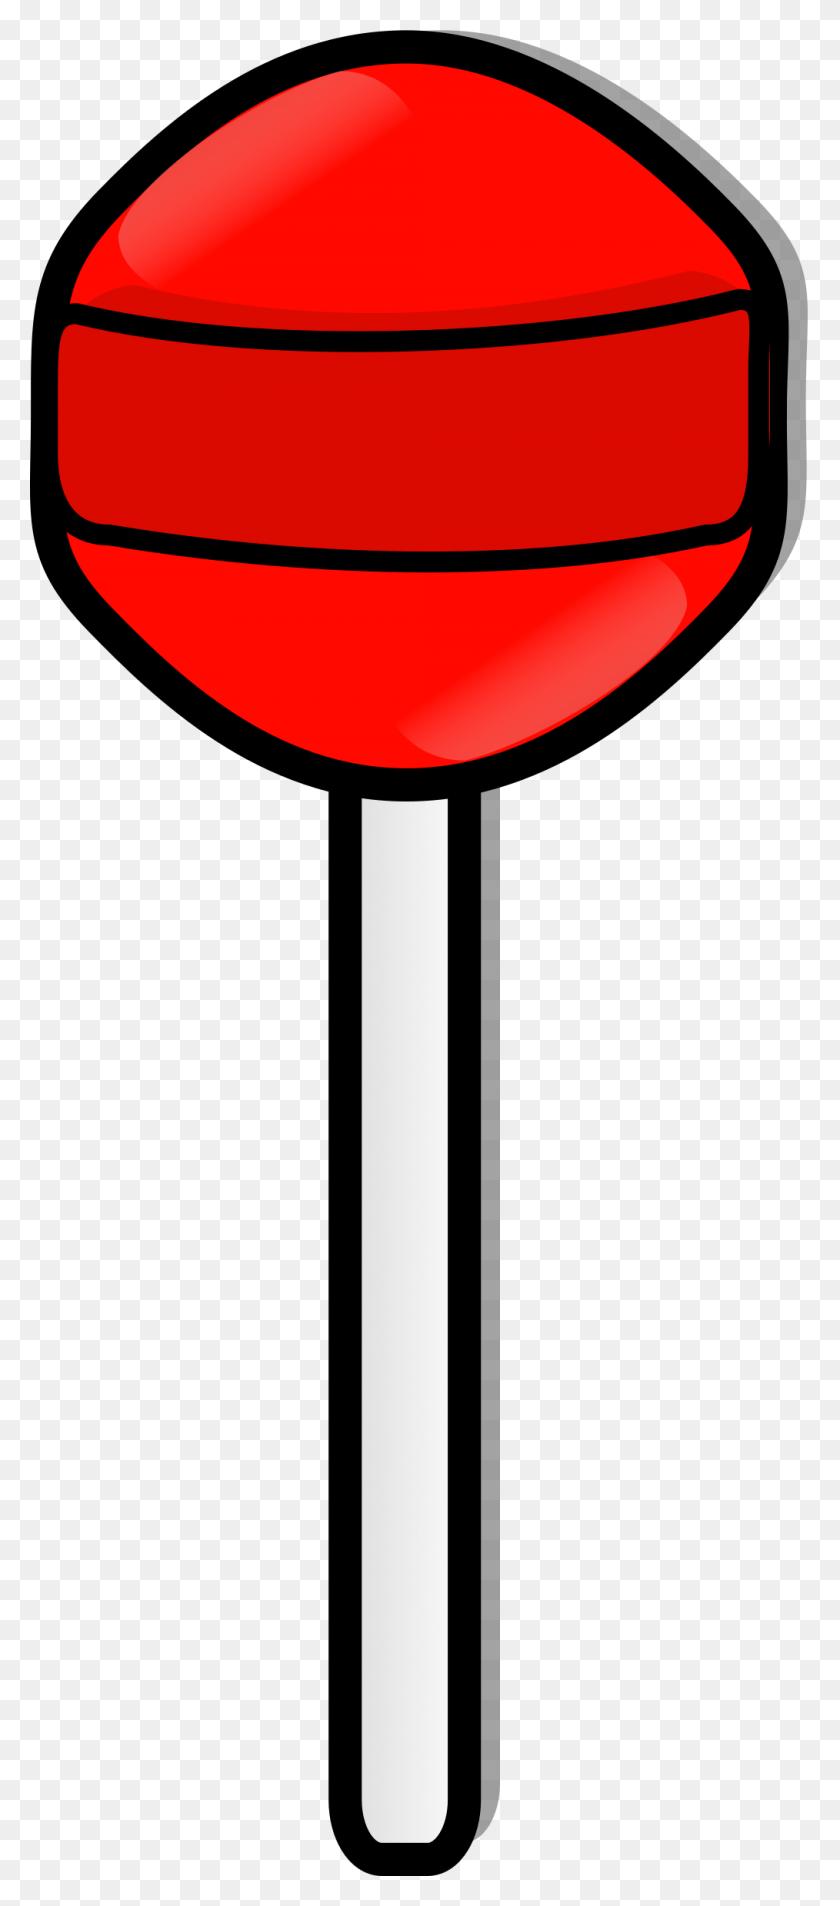 Clipart - Lollipop Clip Art